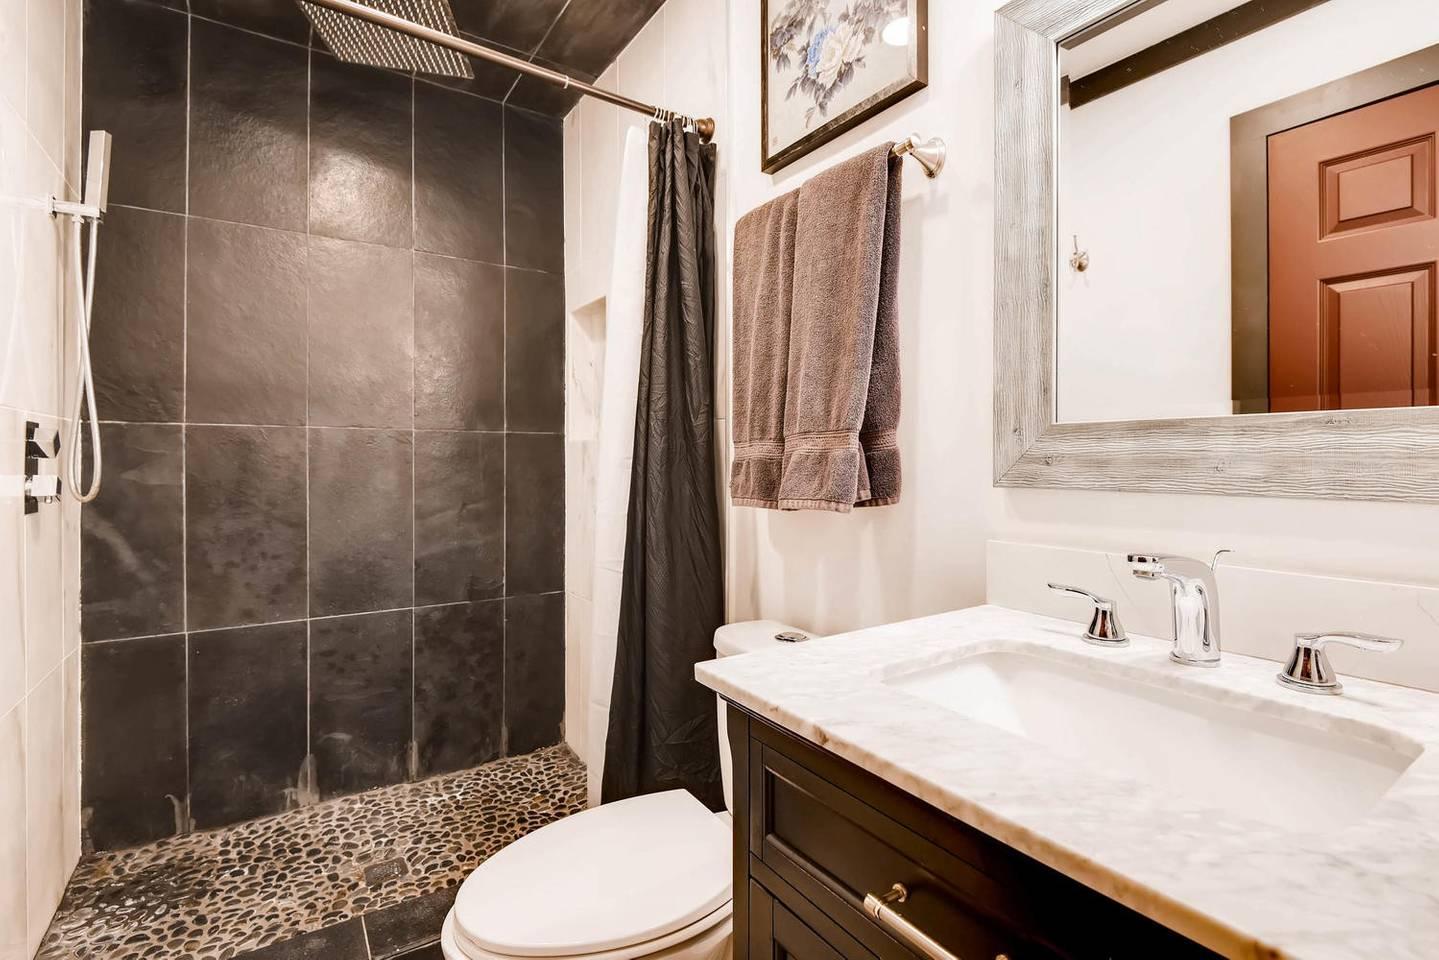 Apartment 7BD 5BA Mansion w  Lazy River Hot Tub Sleeps 26 photo 16926142